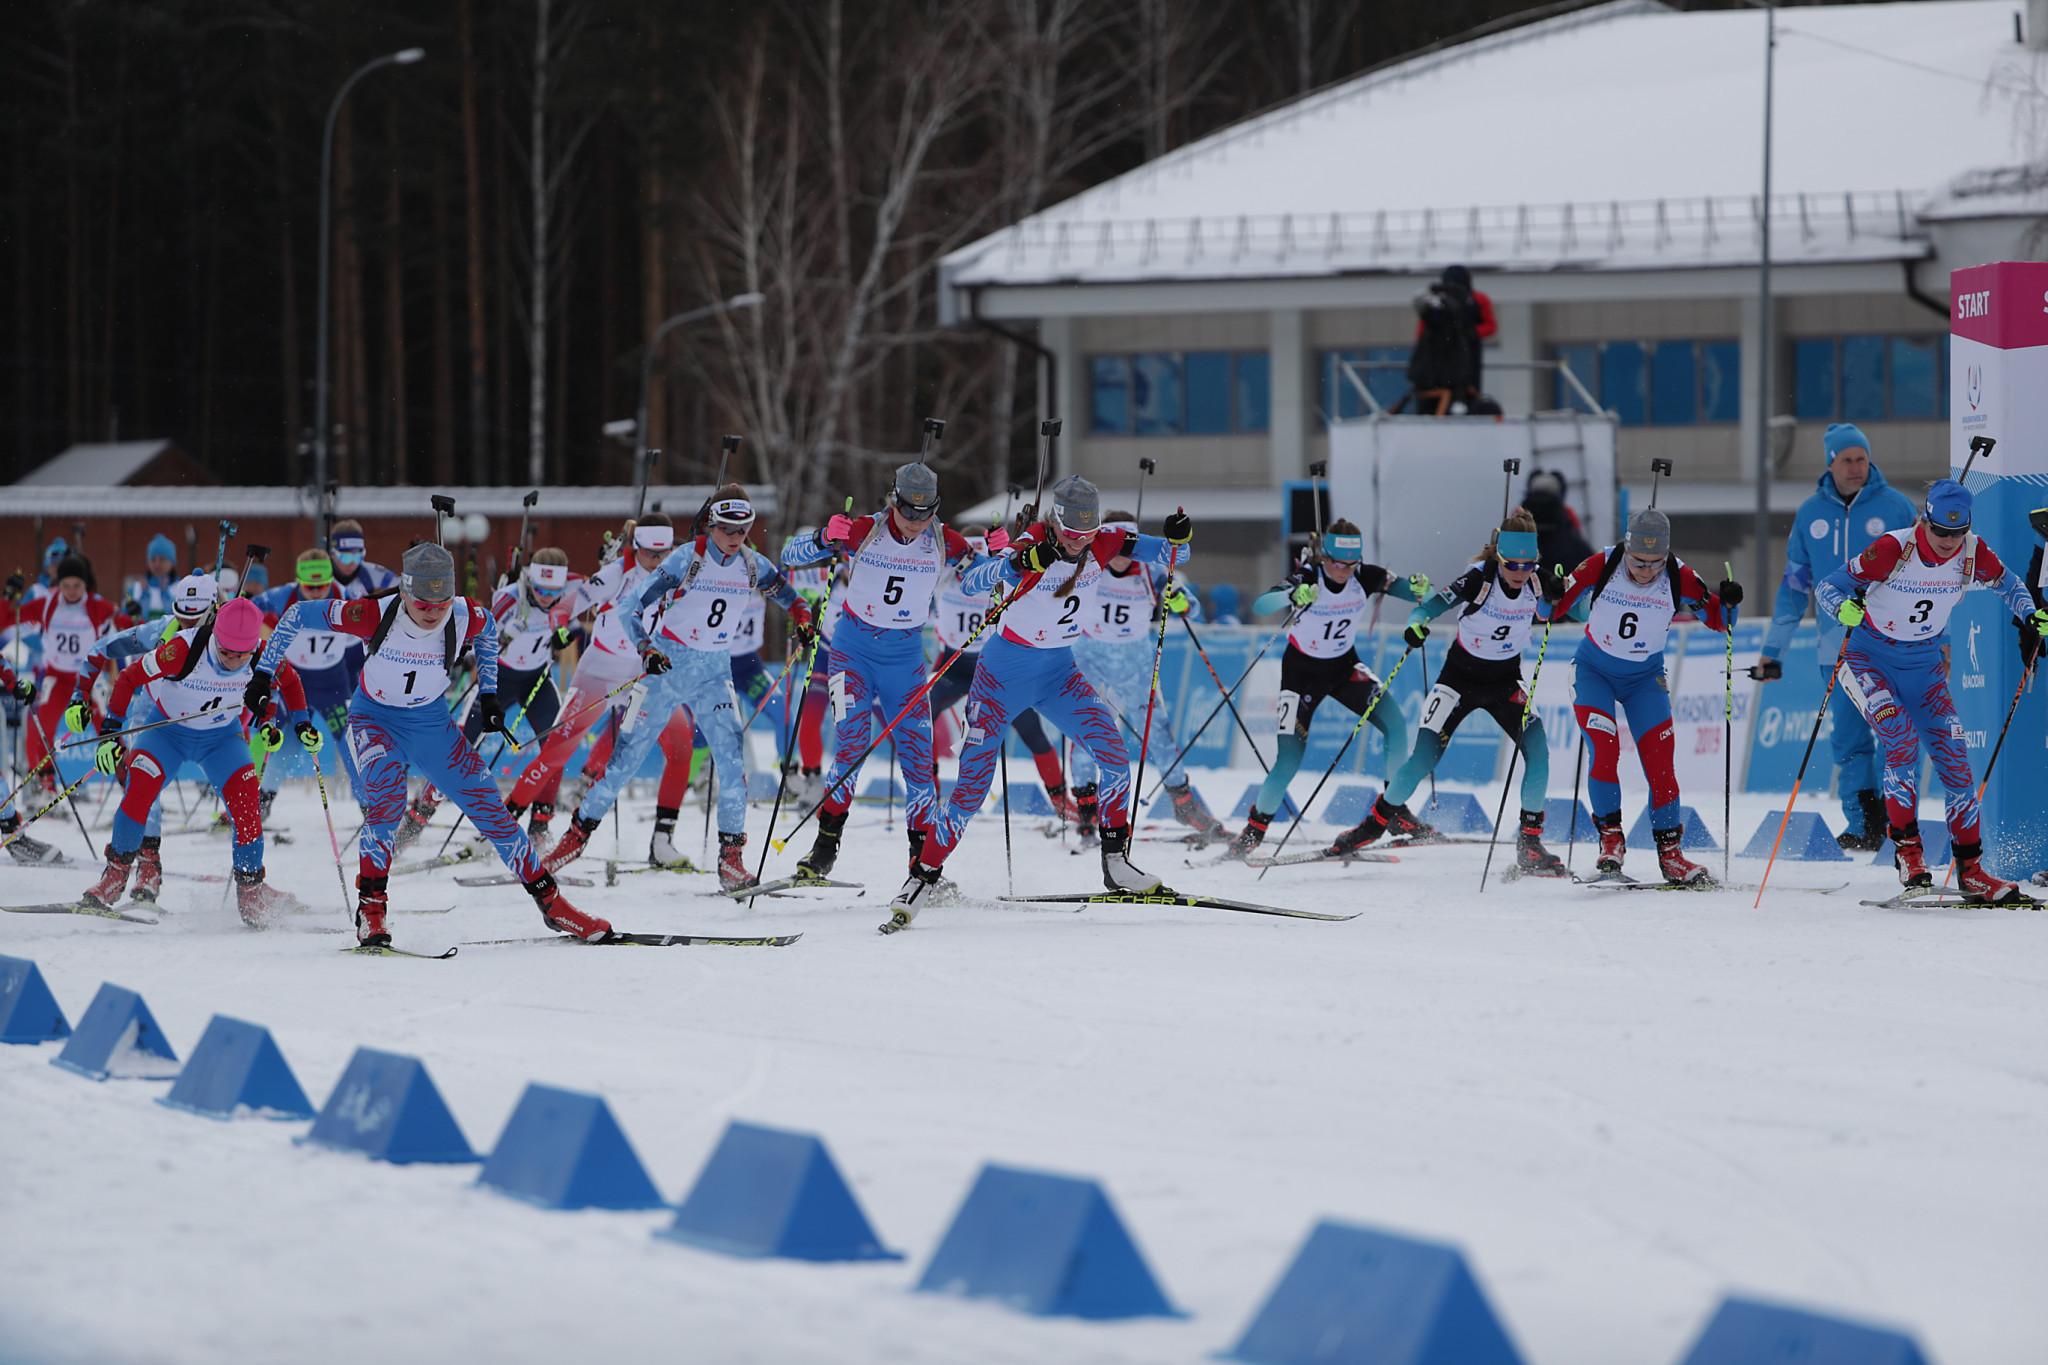 Russia secured a clean sweep in the women's biathlon mass start event at the Krasnoyarsk 2019 Winter Universiade ©Krasnoyarsk 2019